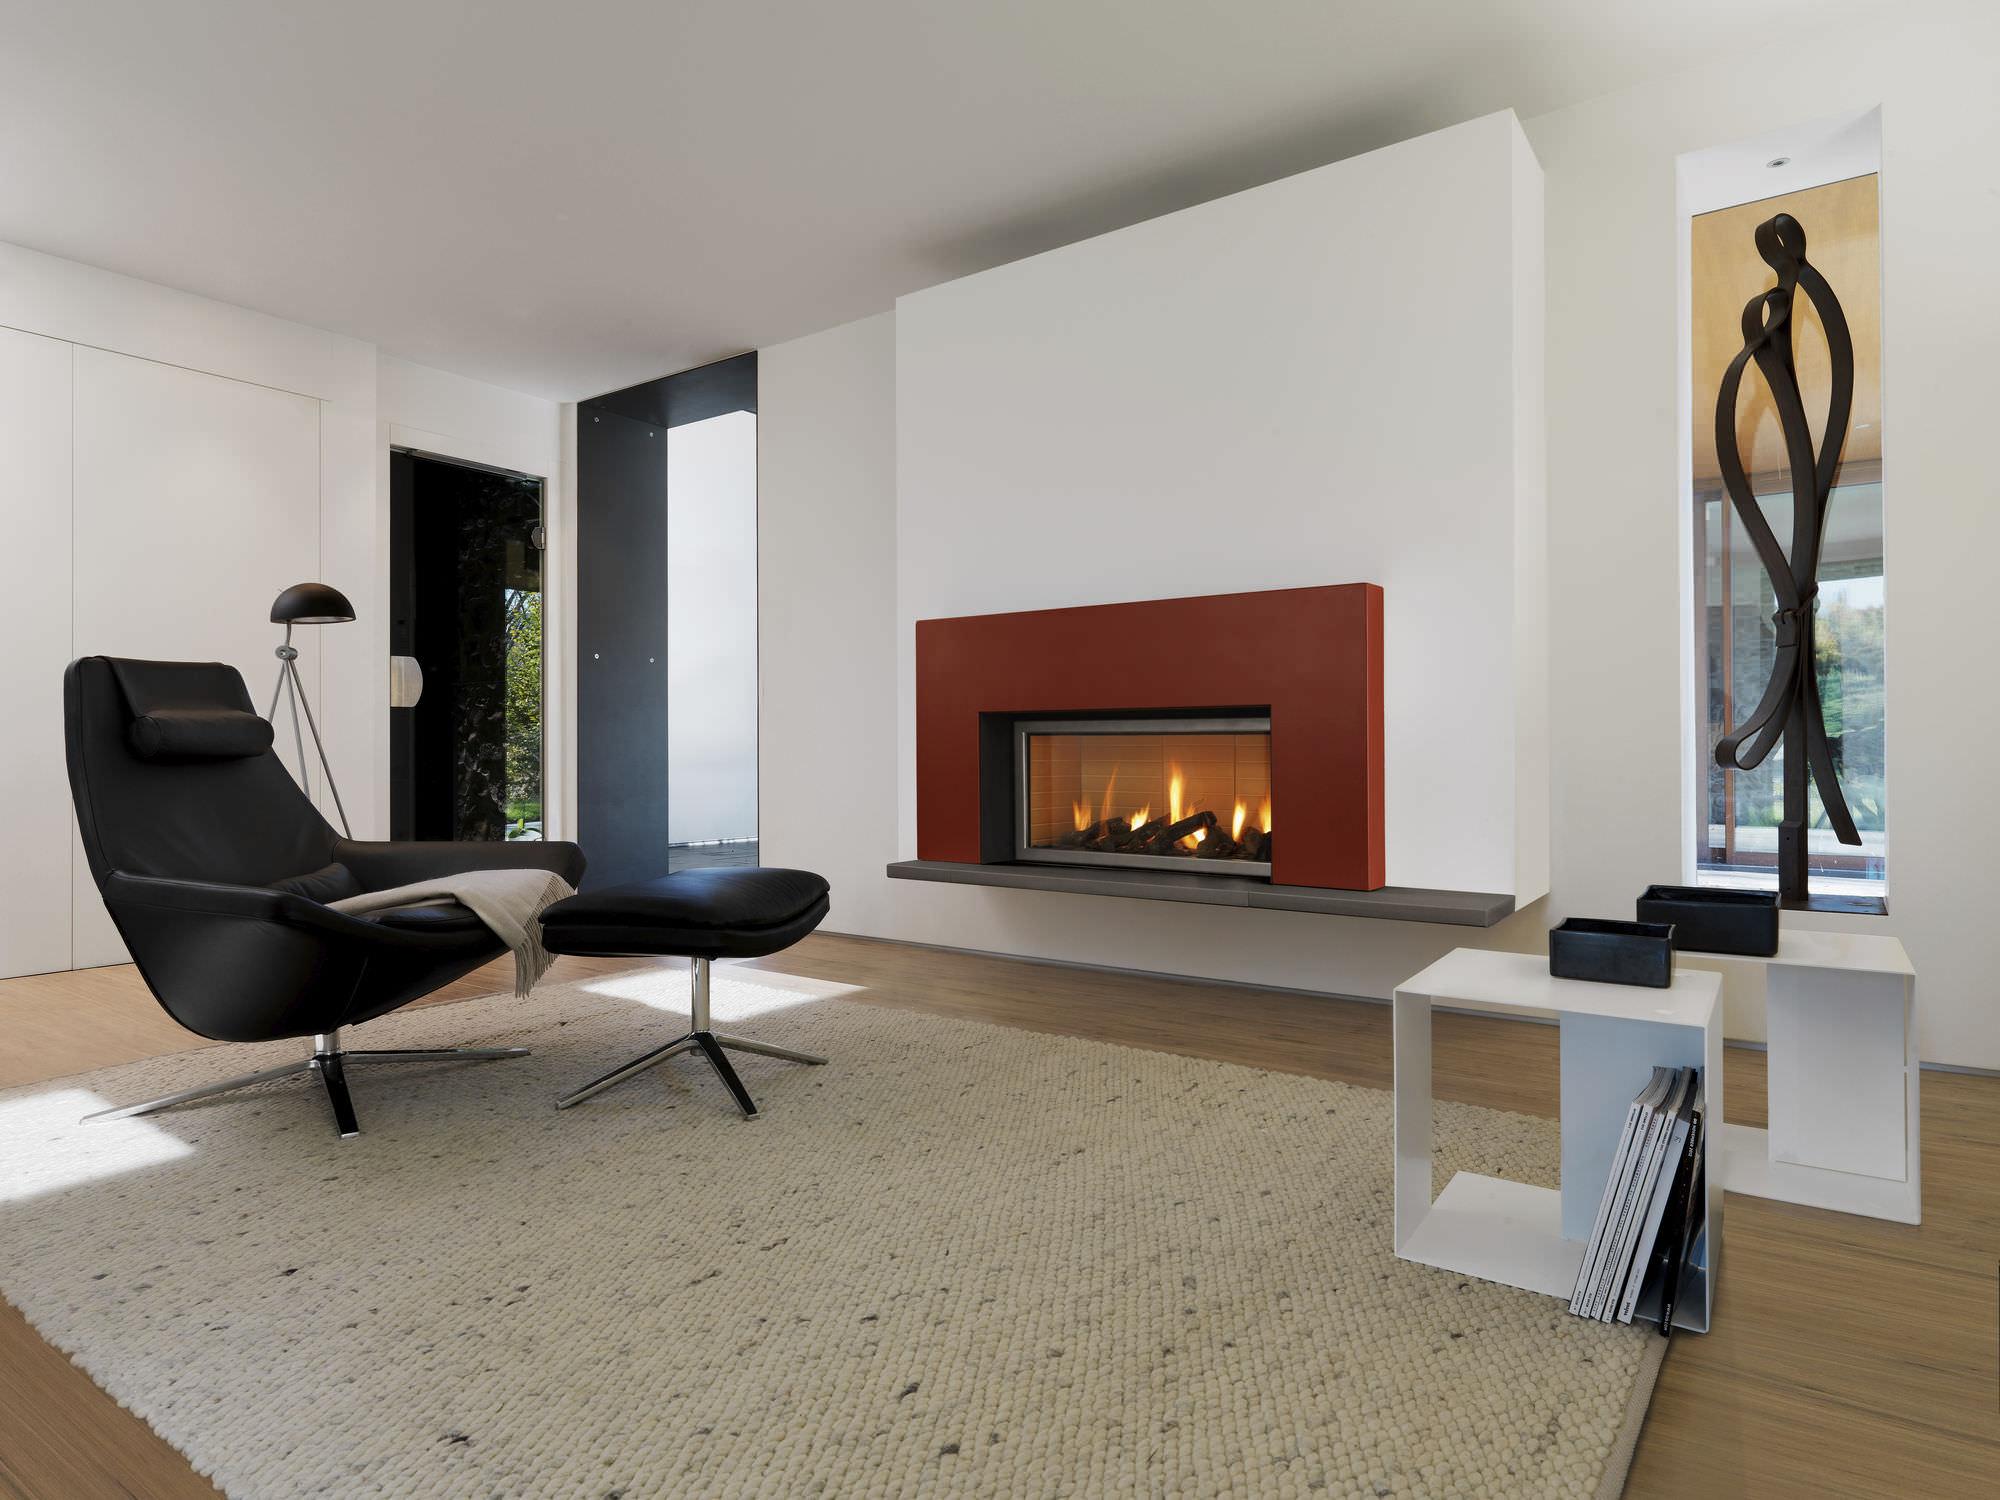 Modern Fireplace Surrounds Ideas: Modern Fireplace Surrounds Mantels